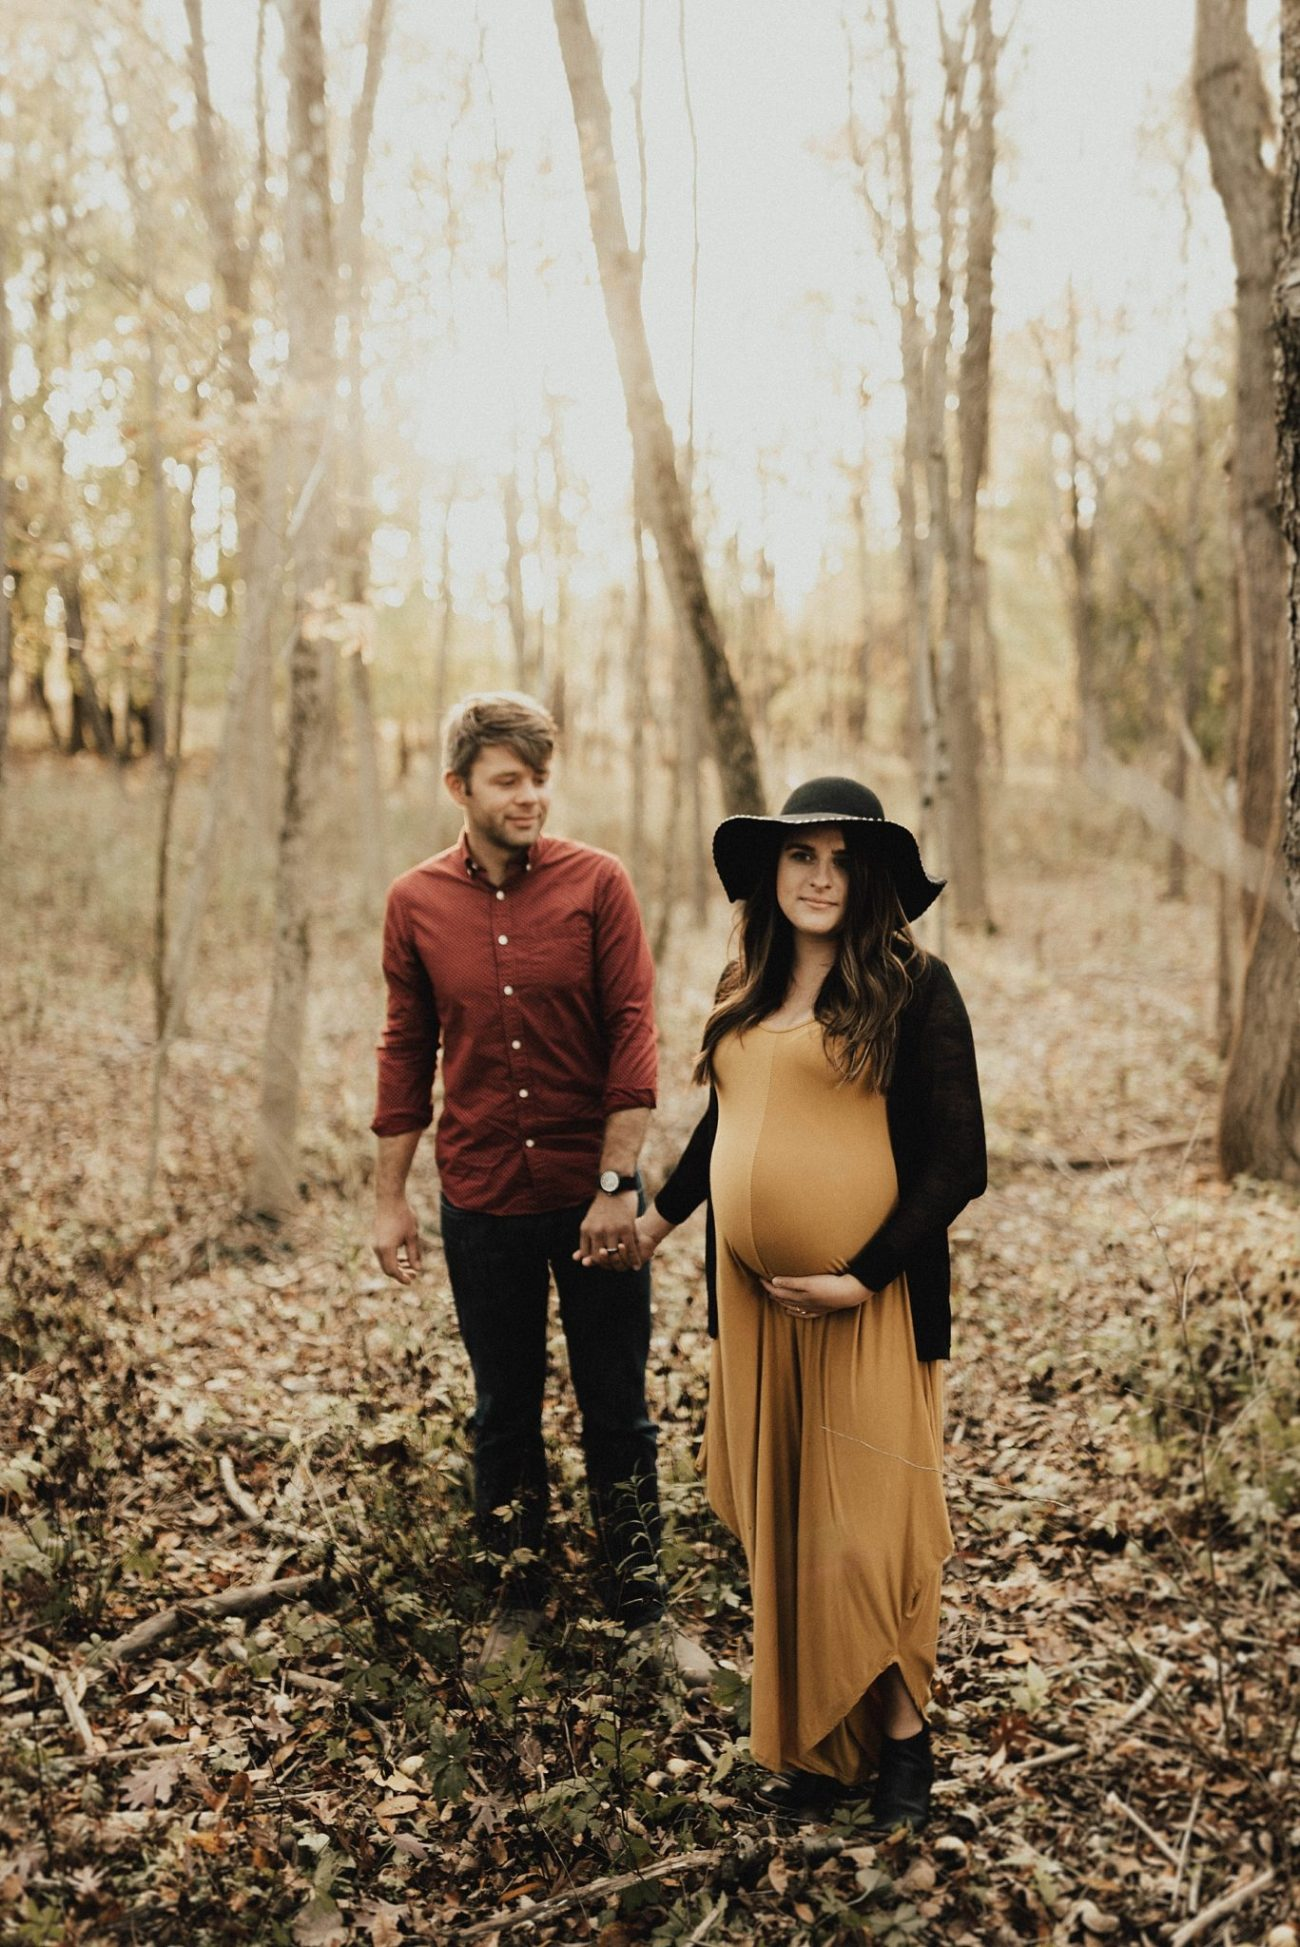 2396b818a Craig + Joanna // Fall Maternity - Lauren F.otography | Central ...